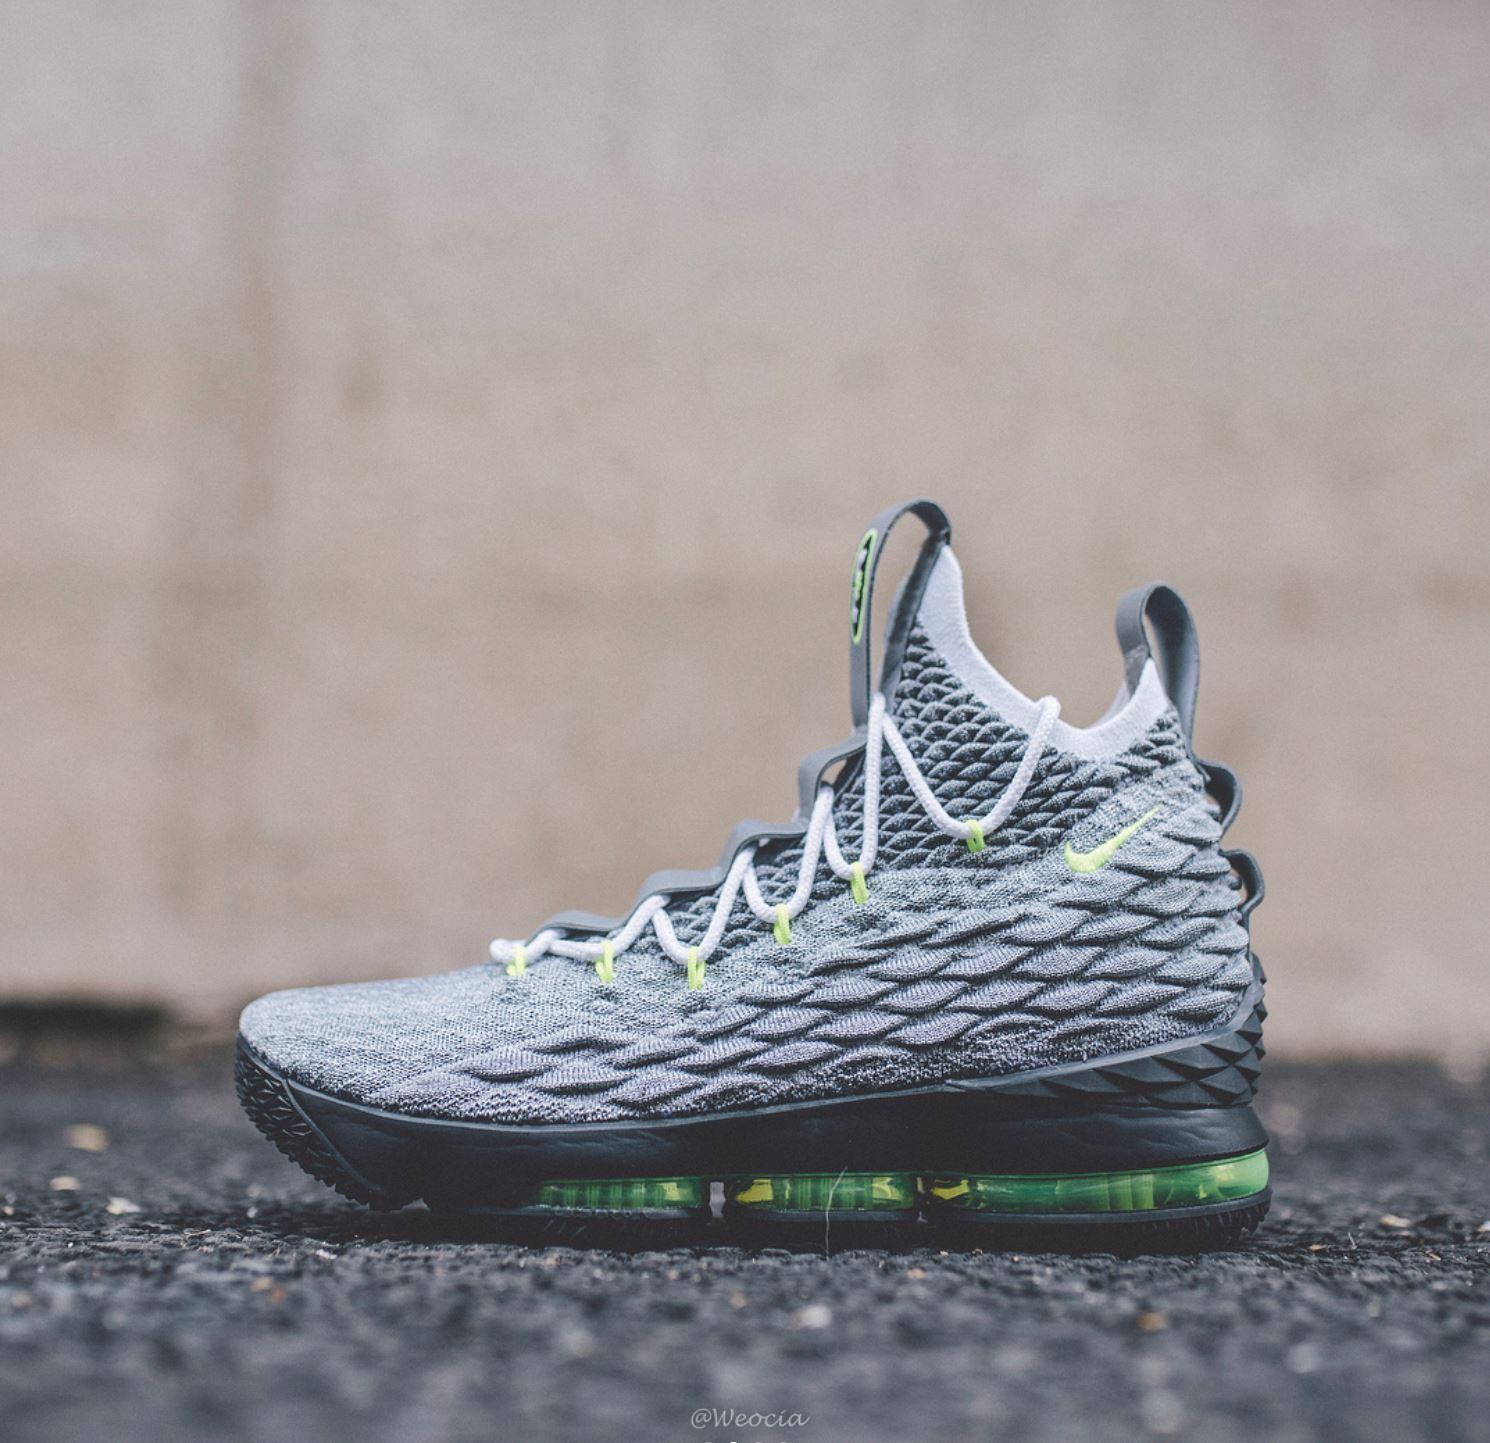 Nike LeBron 15 'Neon 95